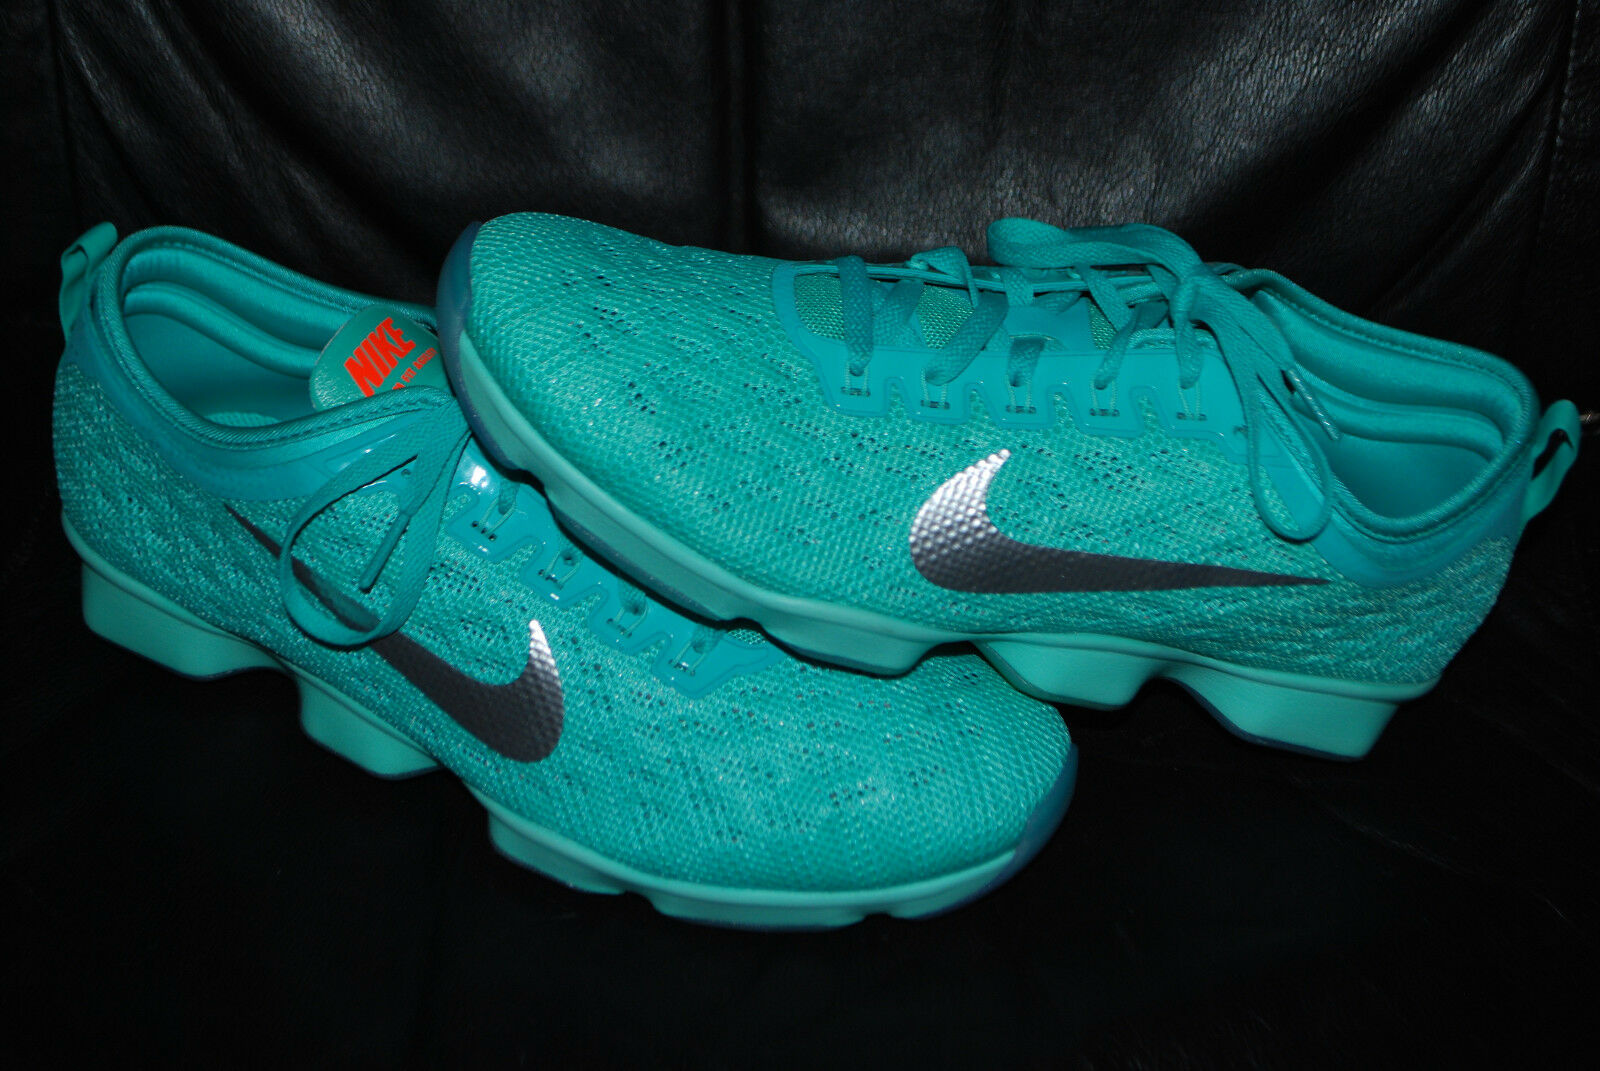 NEW Womens Nike Zoom Fit Agility Hyper Hyper Hyper Jade Training shoes (9.5, 10) 684984-300 f0f520